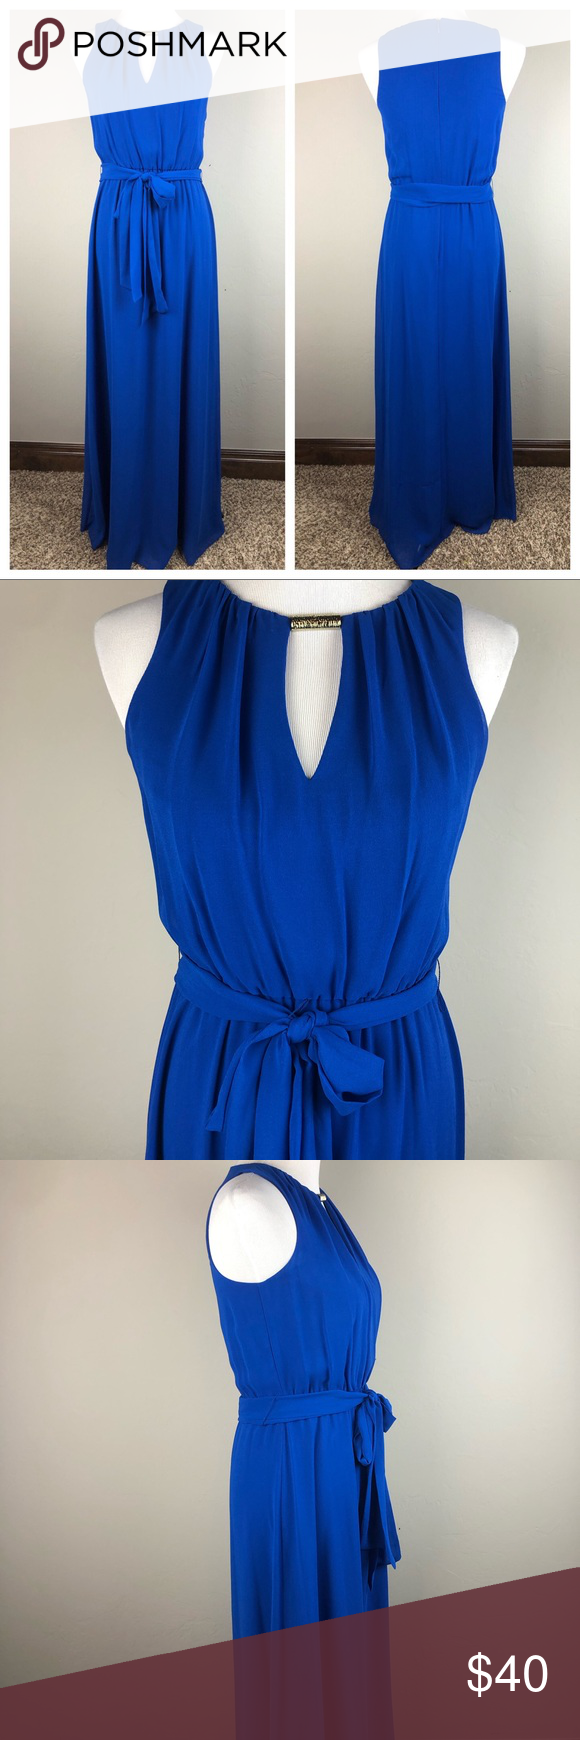 Vince Camuto Royal Blue Keyhole Maxi Dress 2 Maxi Dress Sleeveless Maxi Dress Dresses [ 1740 x 580 Pixel ]